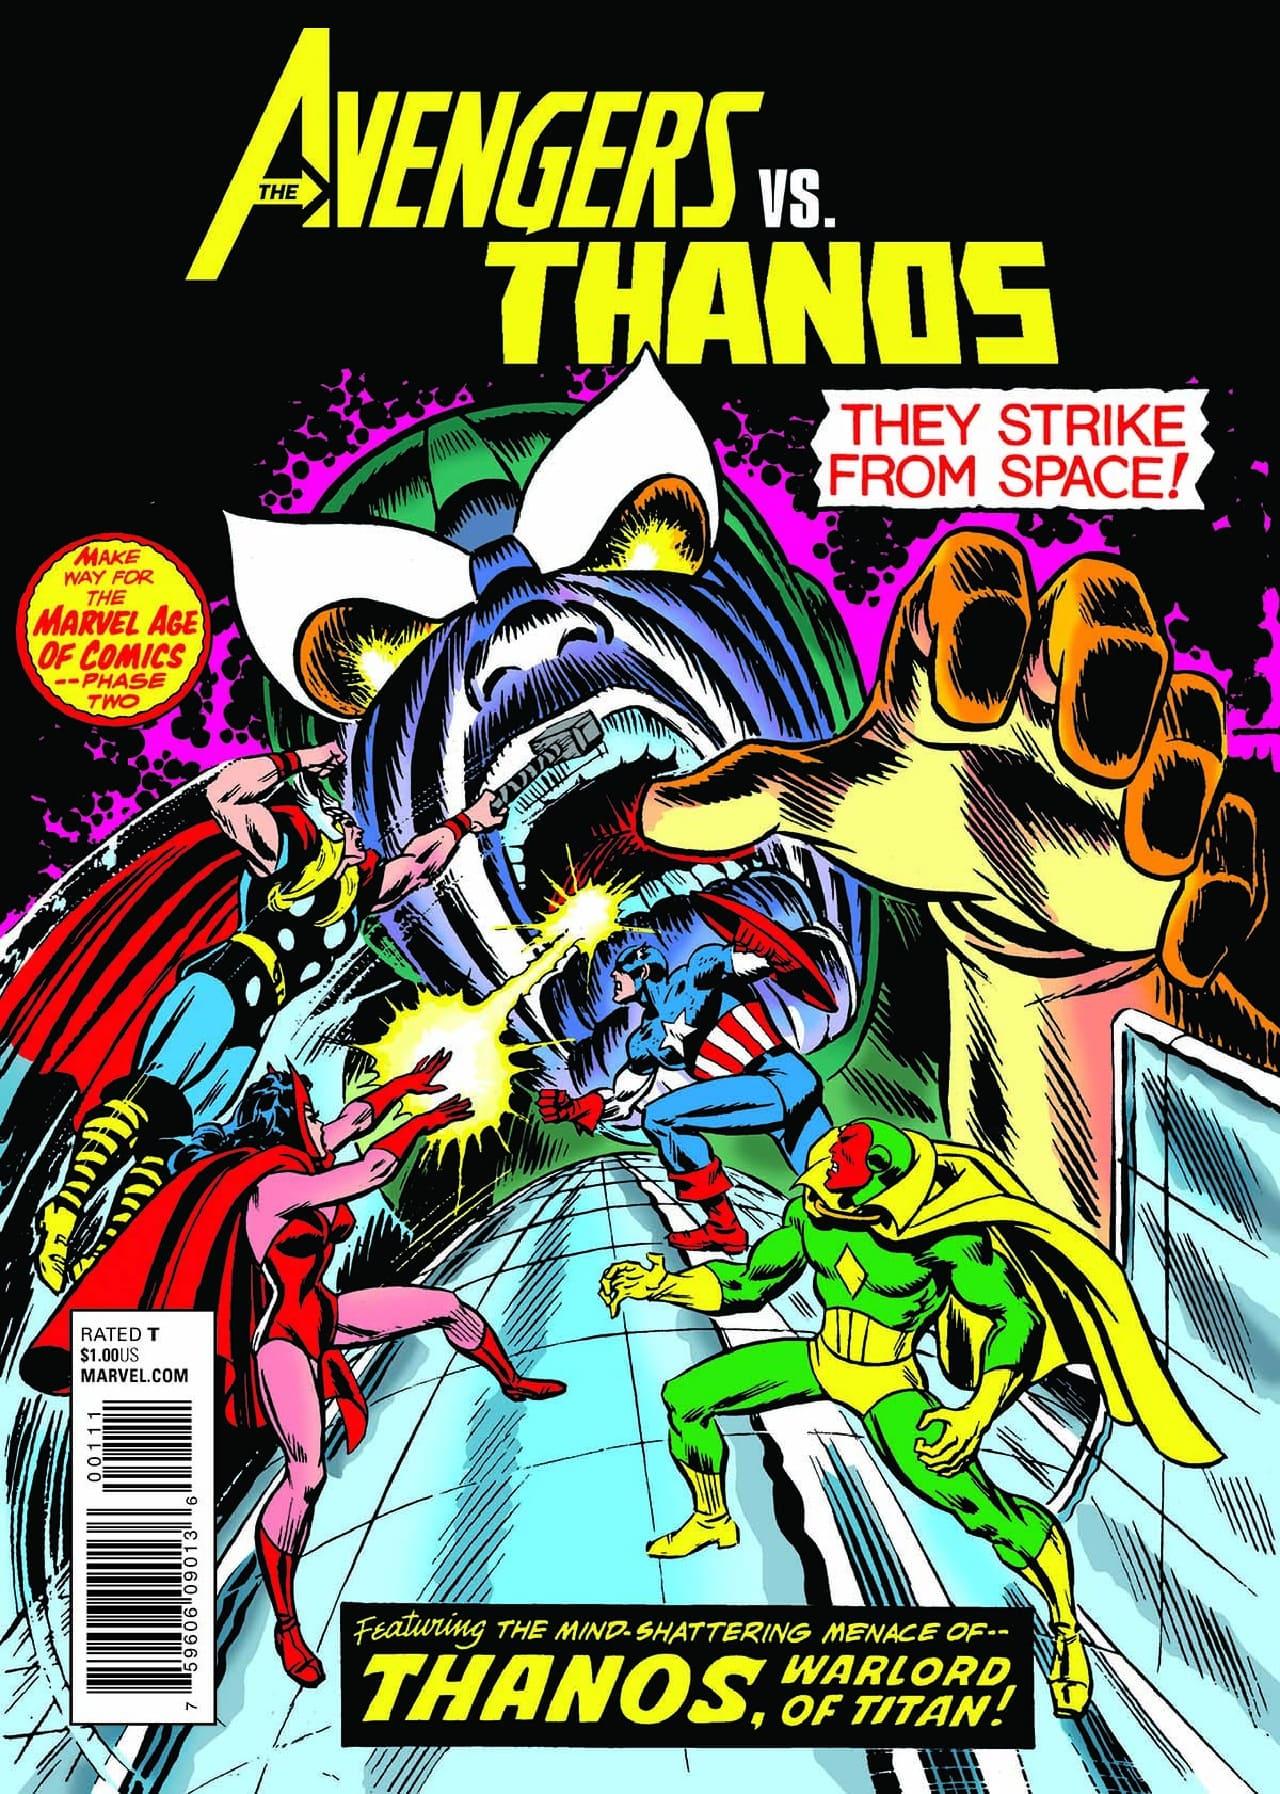 thanos avengers cubo cómics historietas